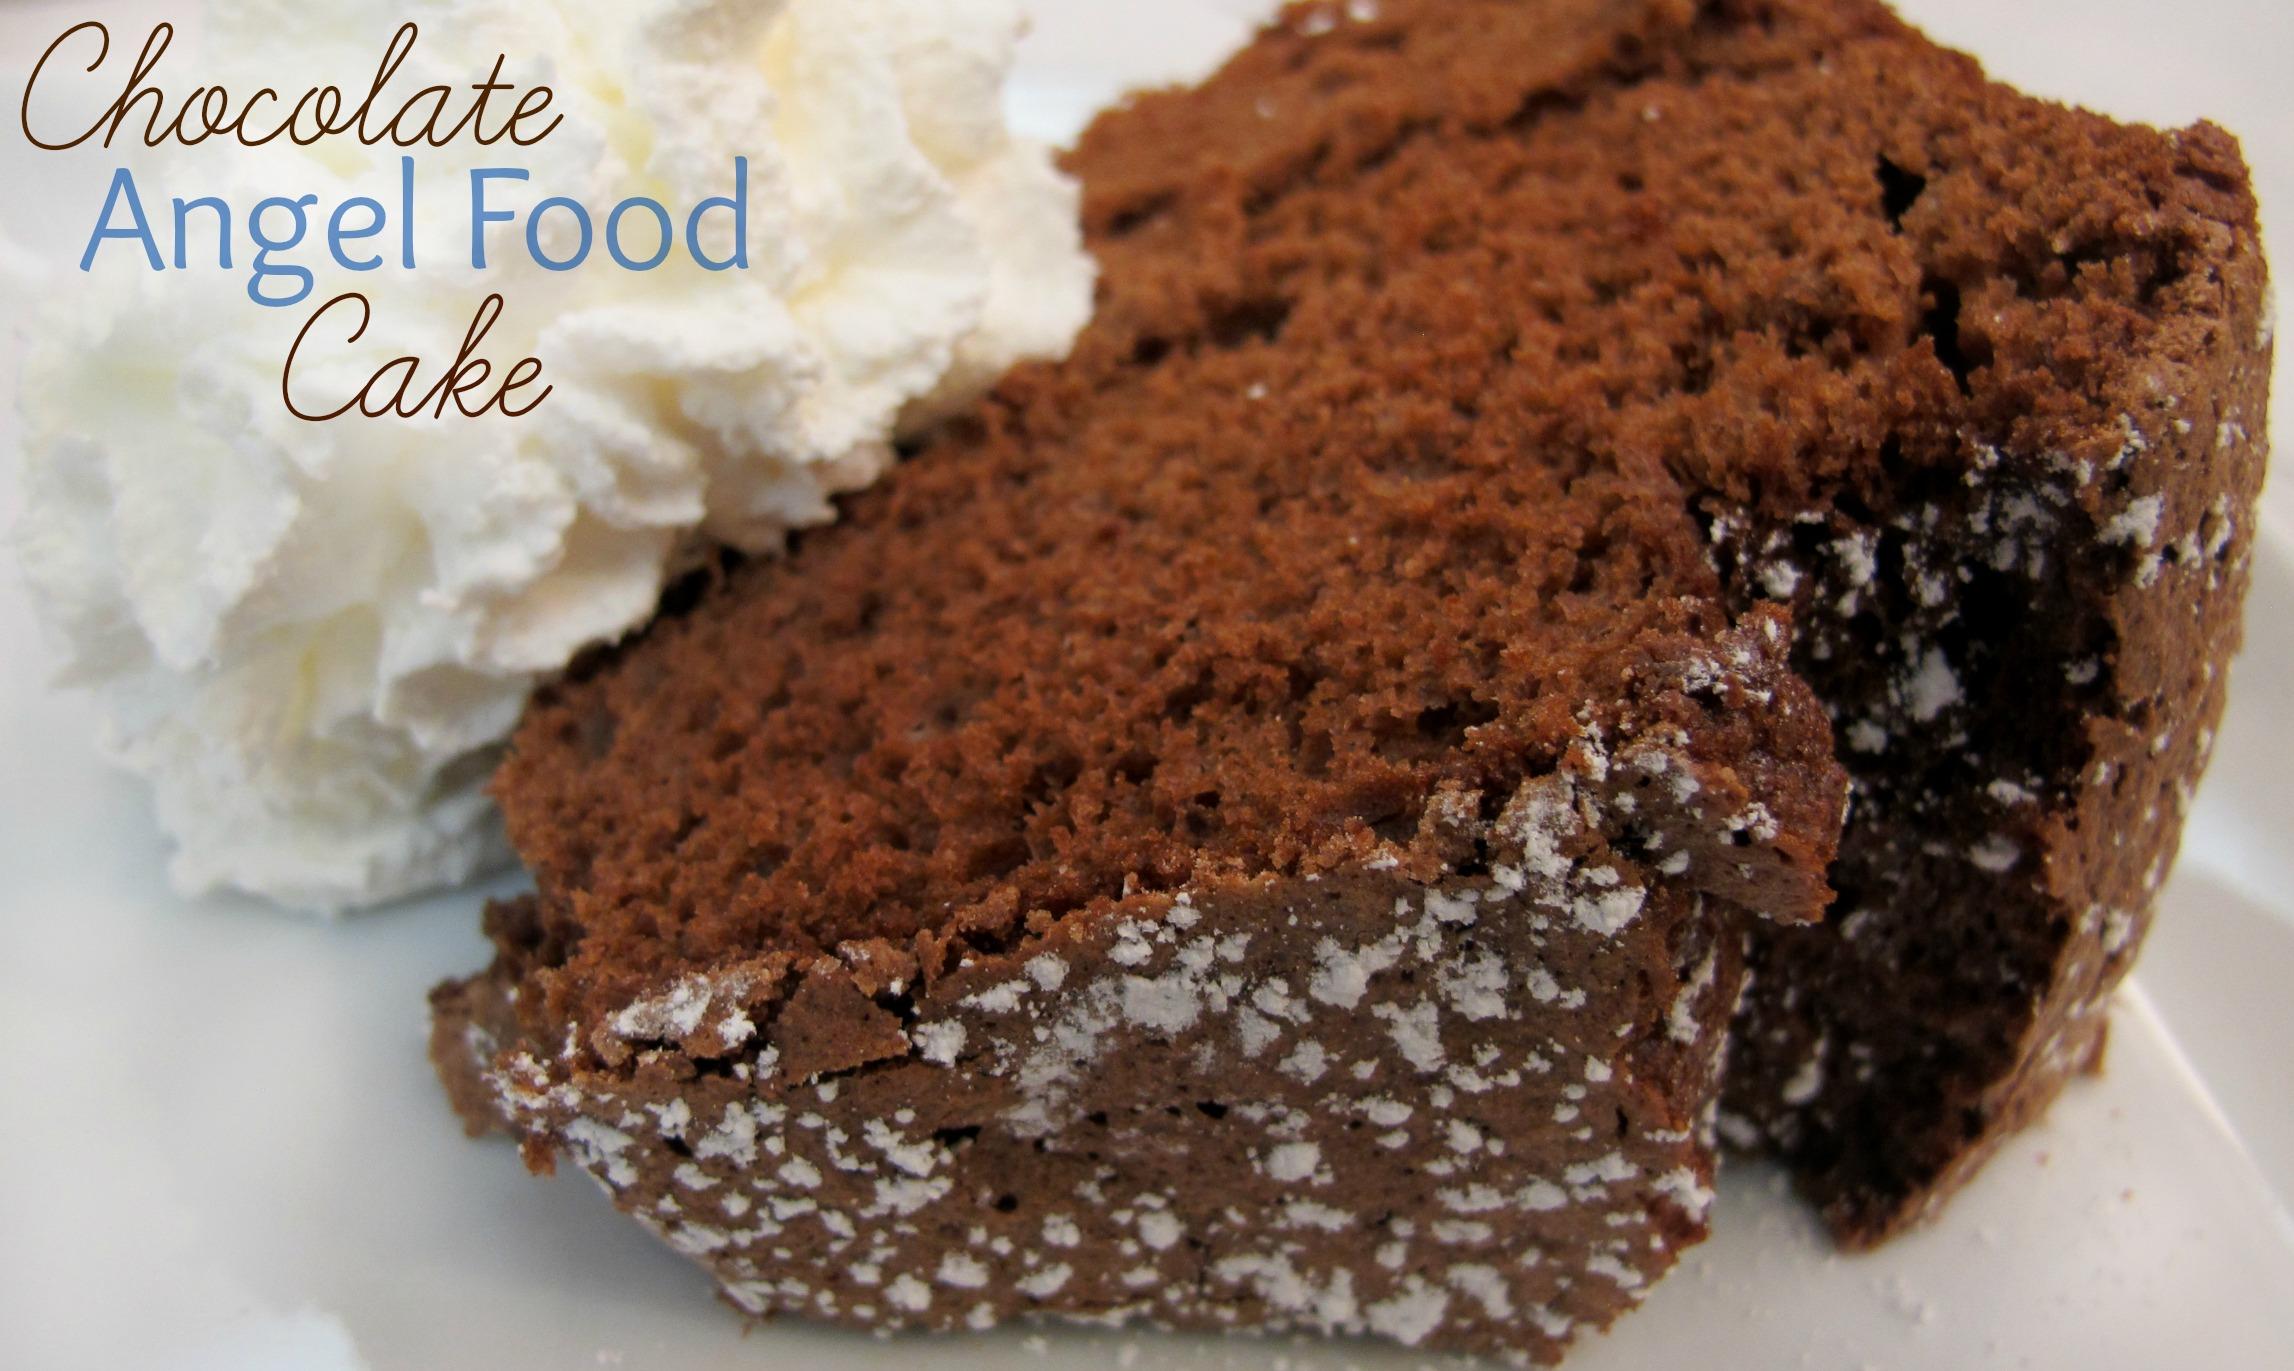 Chocolate Angel Food Cake |